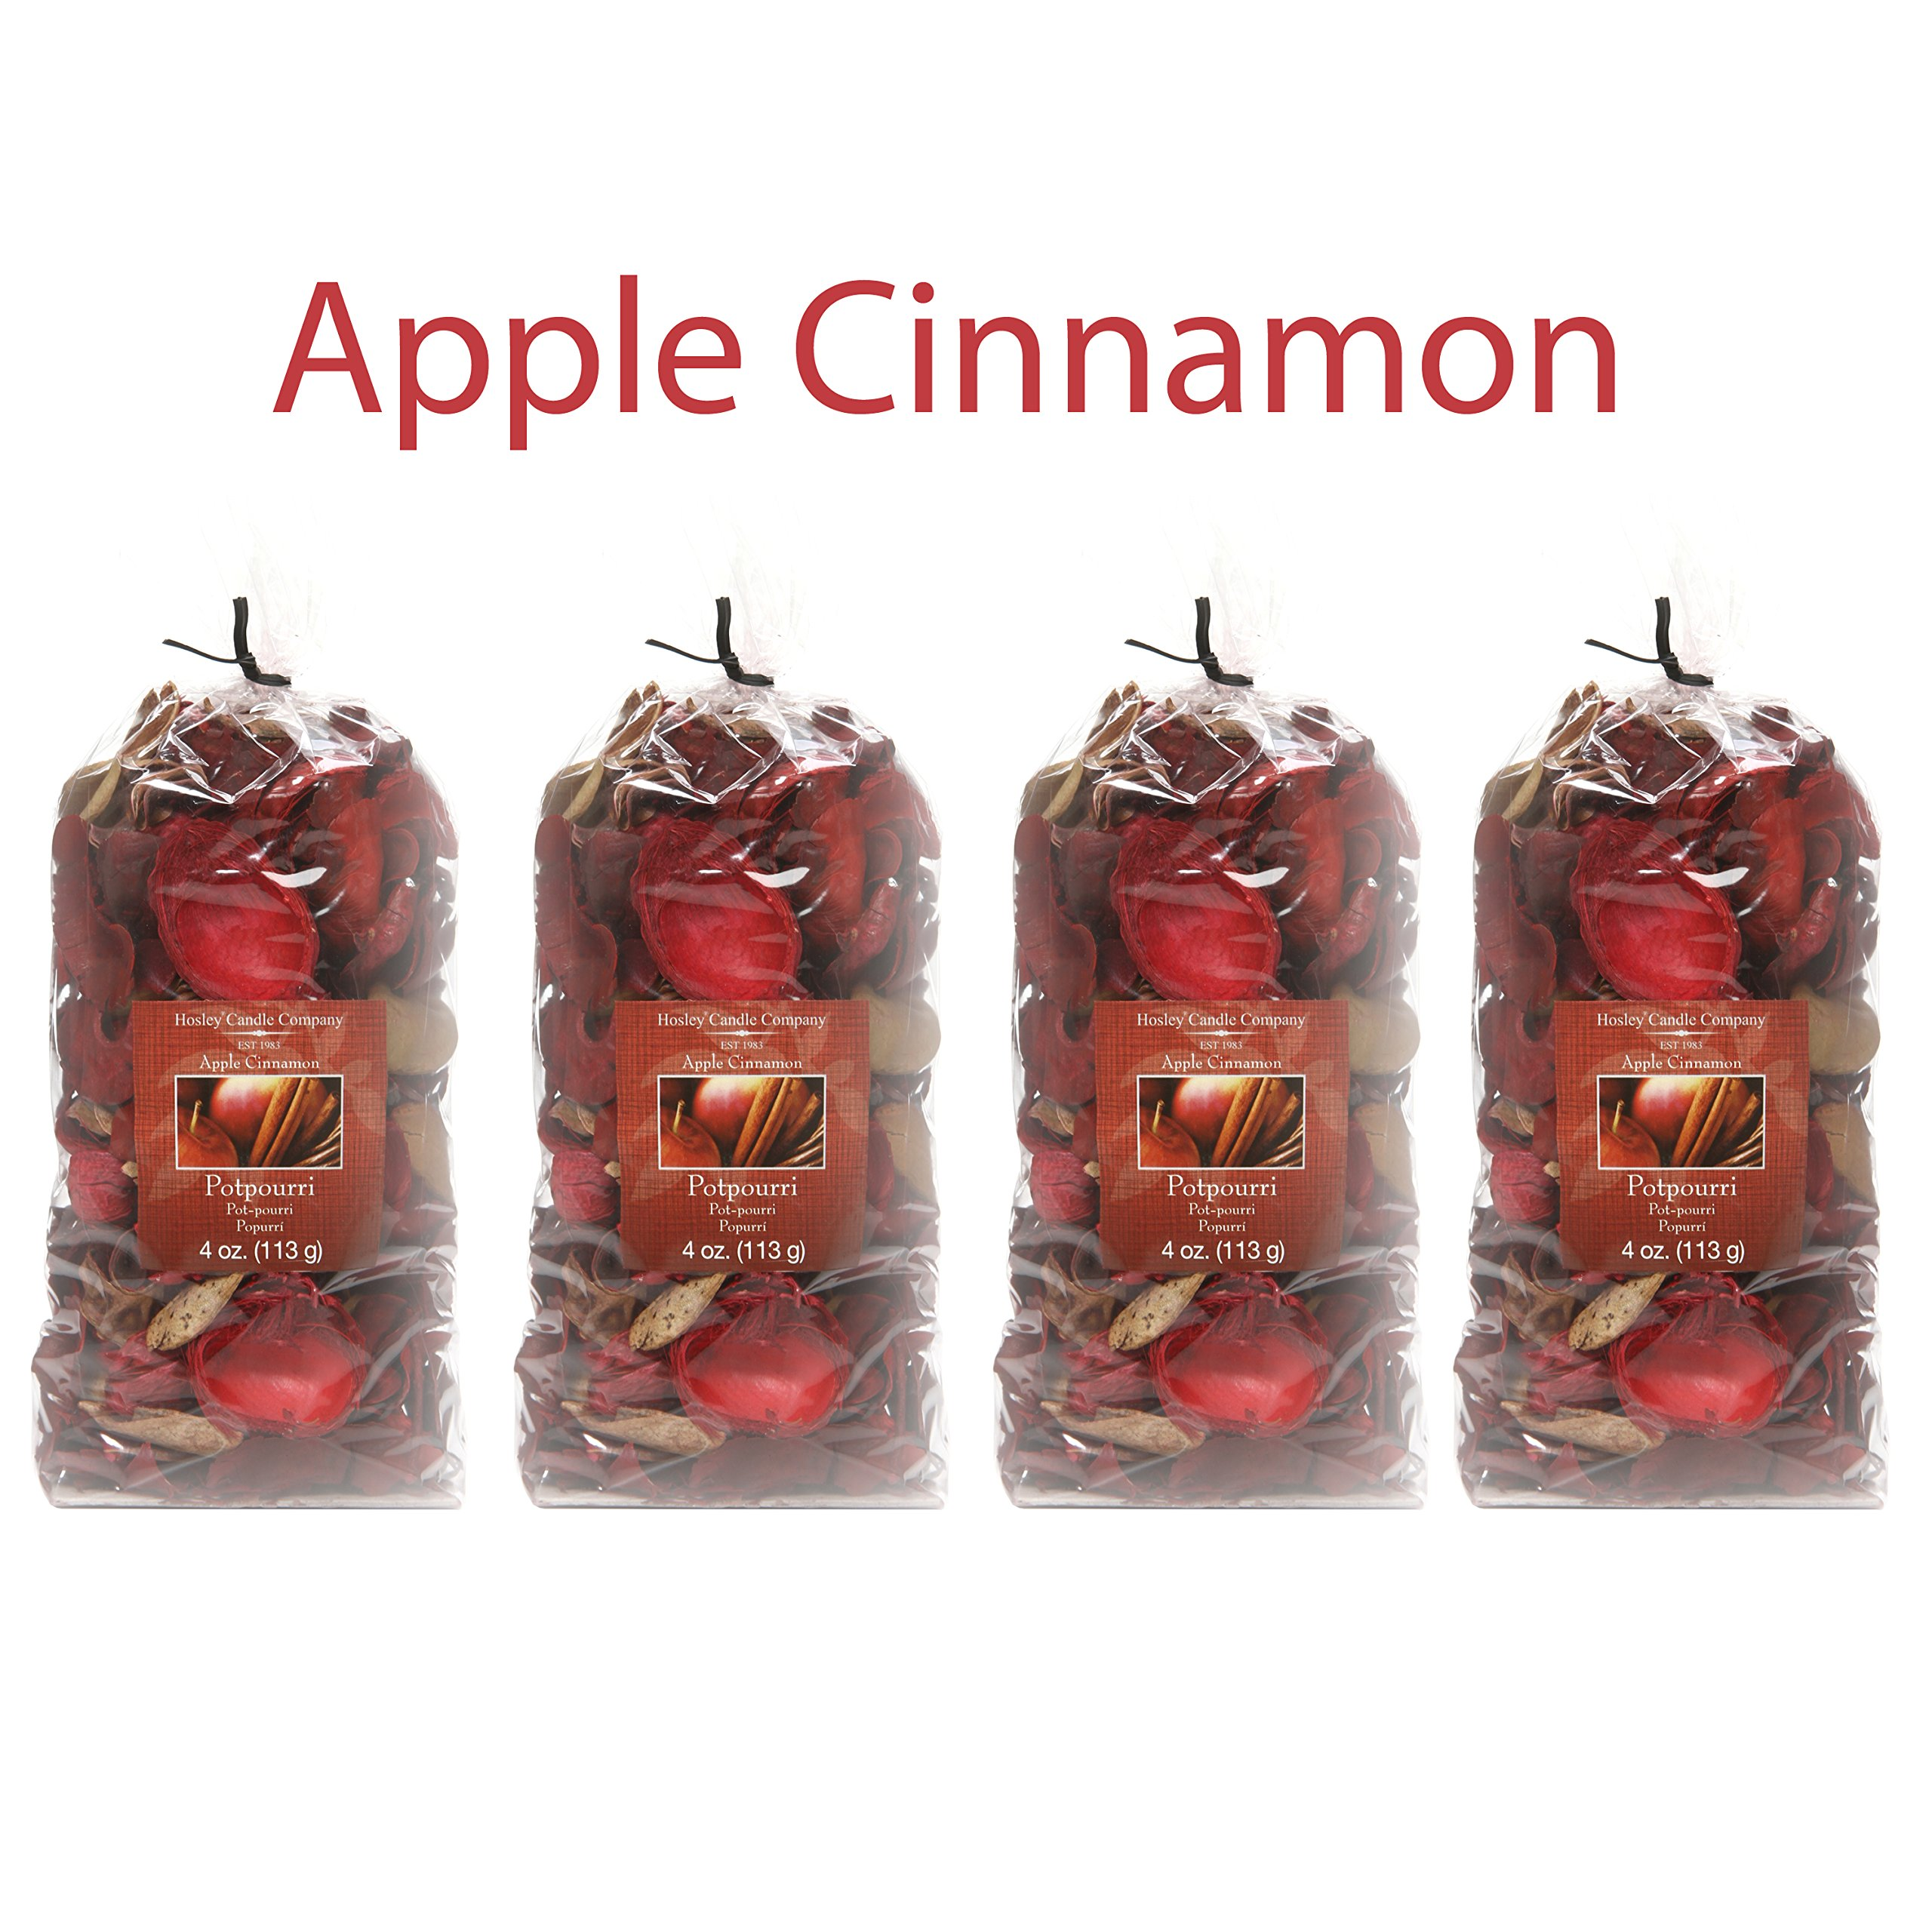 Hosley Apple Cinnamon Potpourri- 16 Oz. Bonus Buy 4 Bags/4 Oz Each. Ideal for dried floral arrangements or with Orbs, Potpourri or Just As Decor